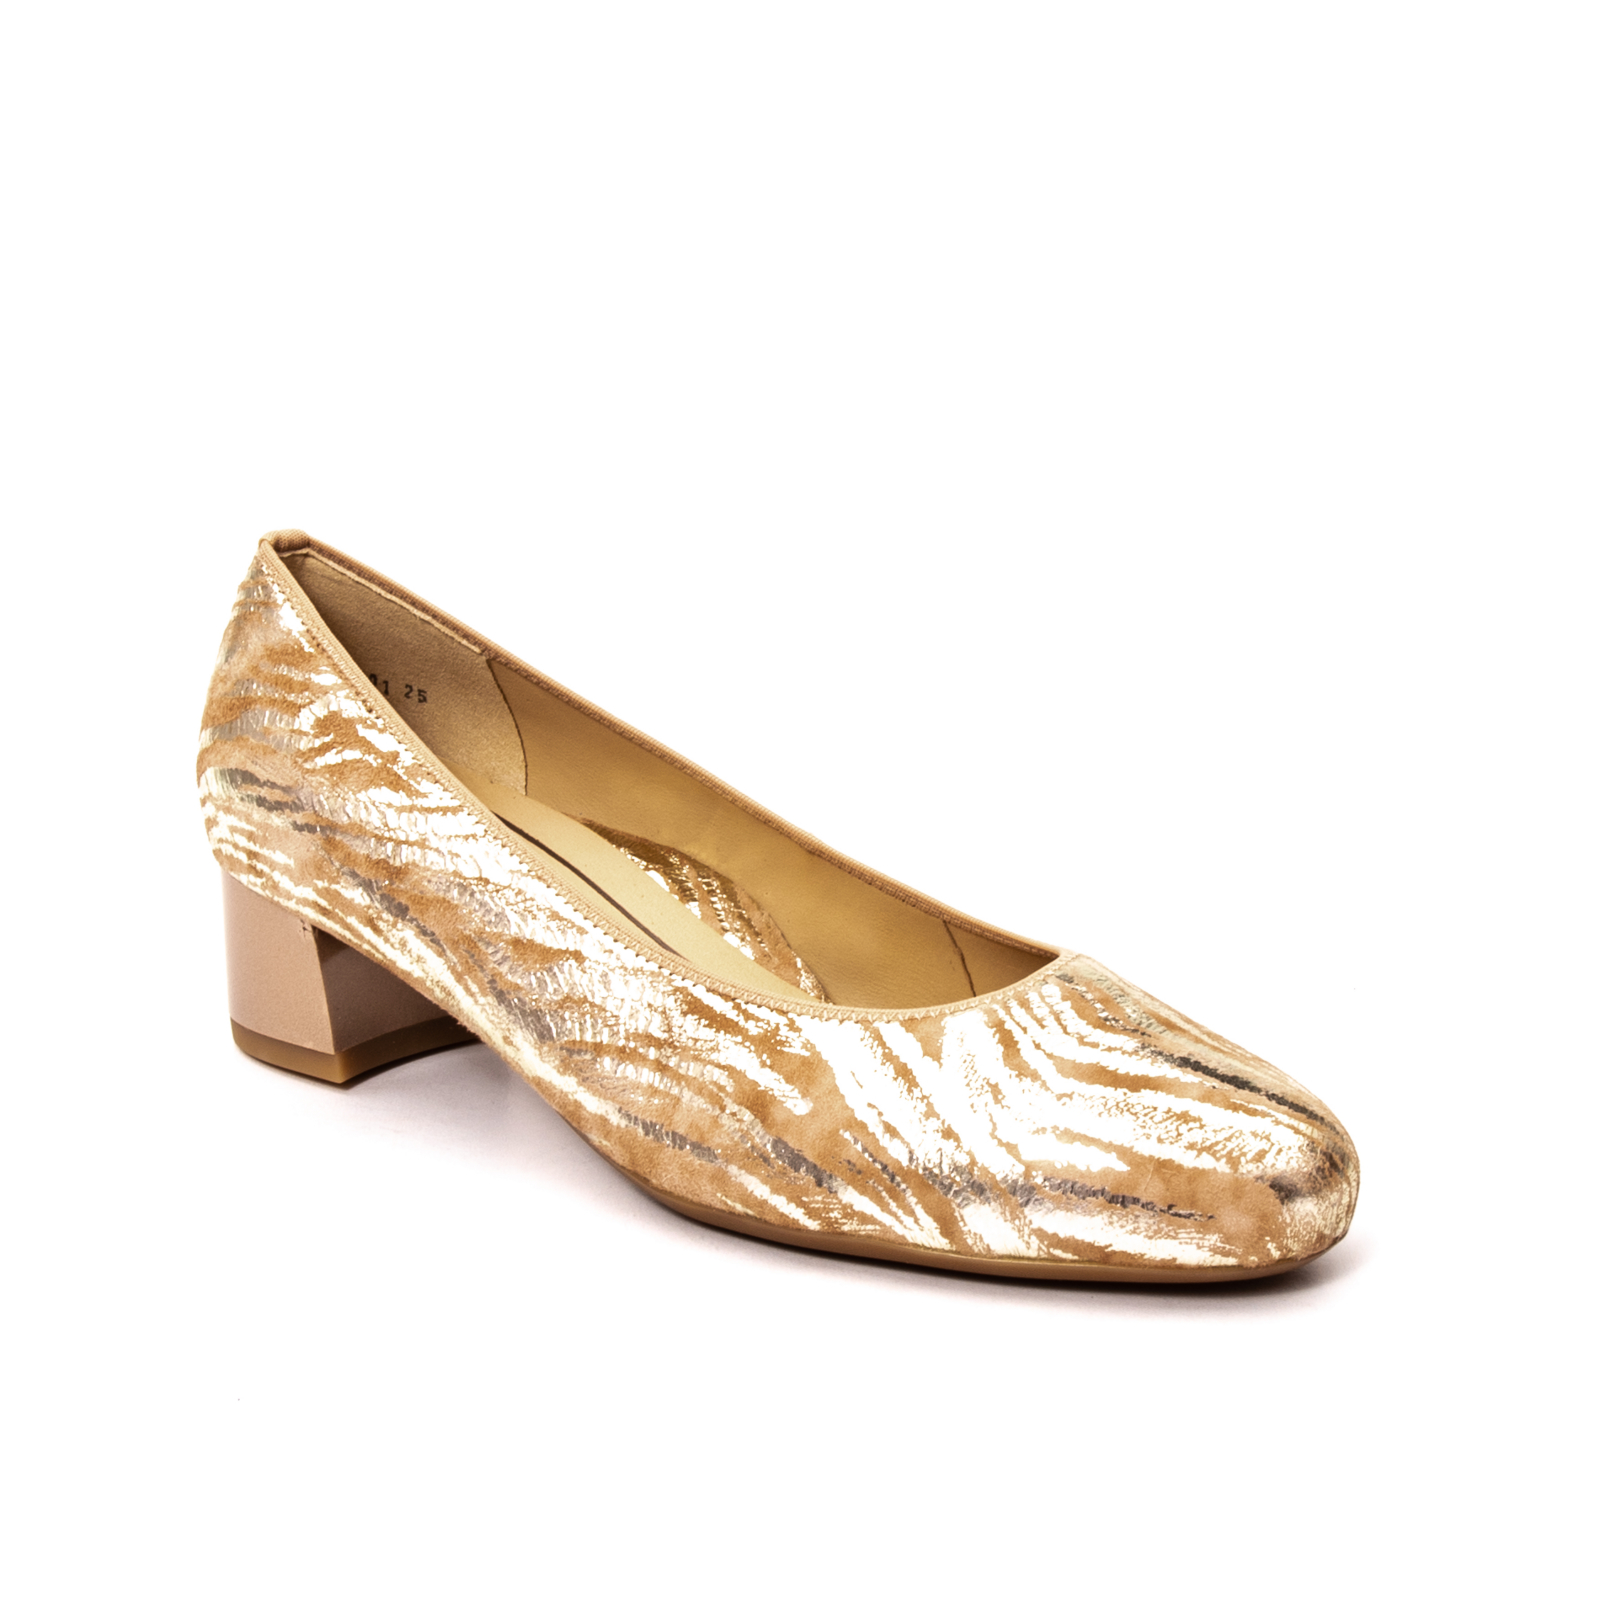 Ordin produs nou vânzări cu ridicata Pantofi dama piele naturala Ara 16601, camel-auriu - Ara